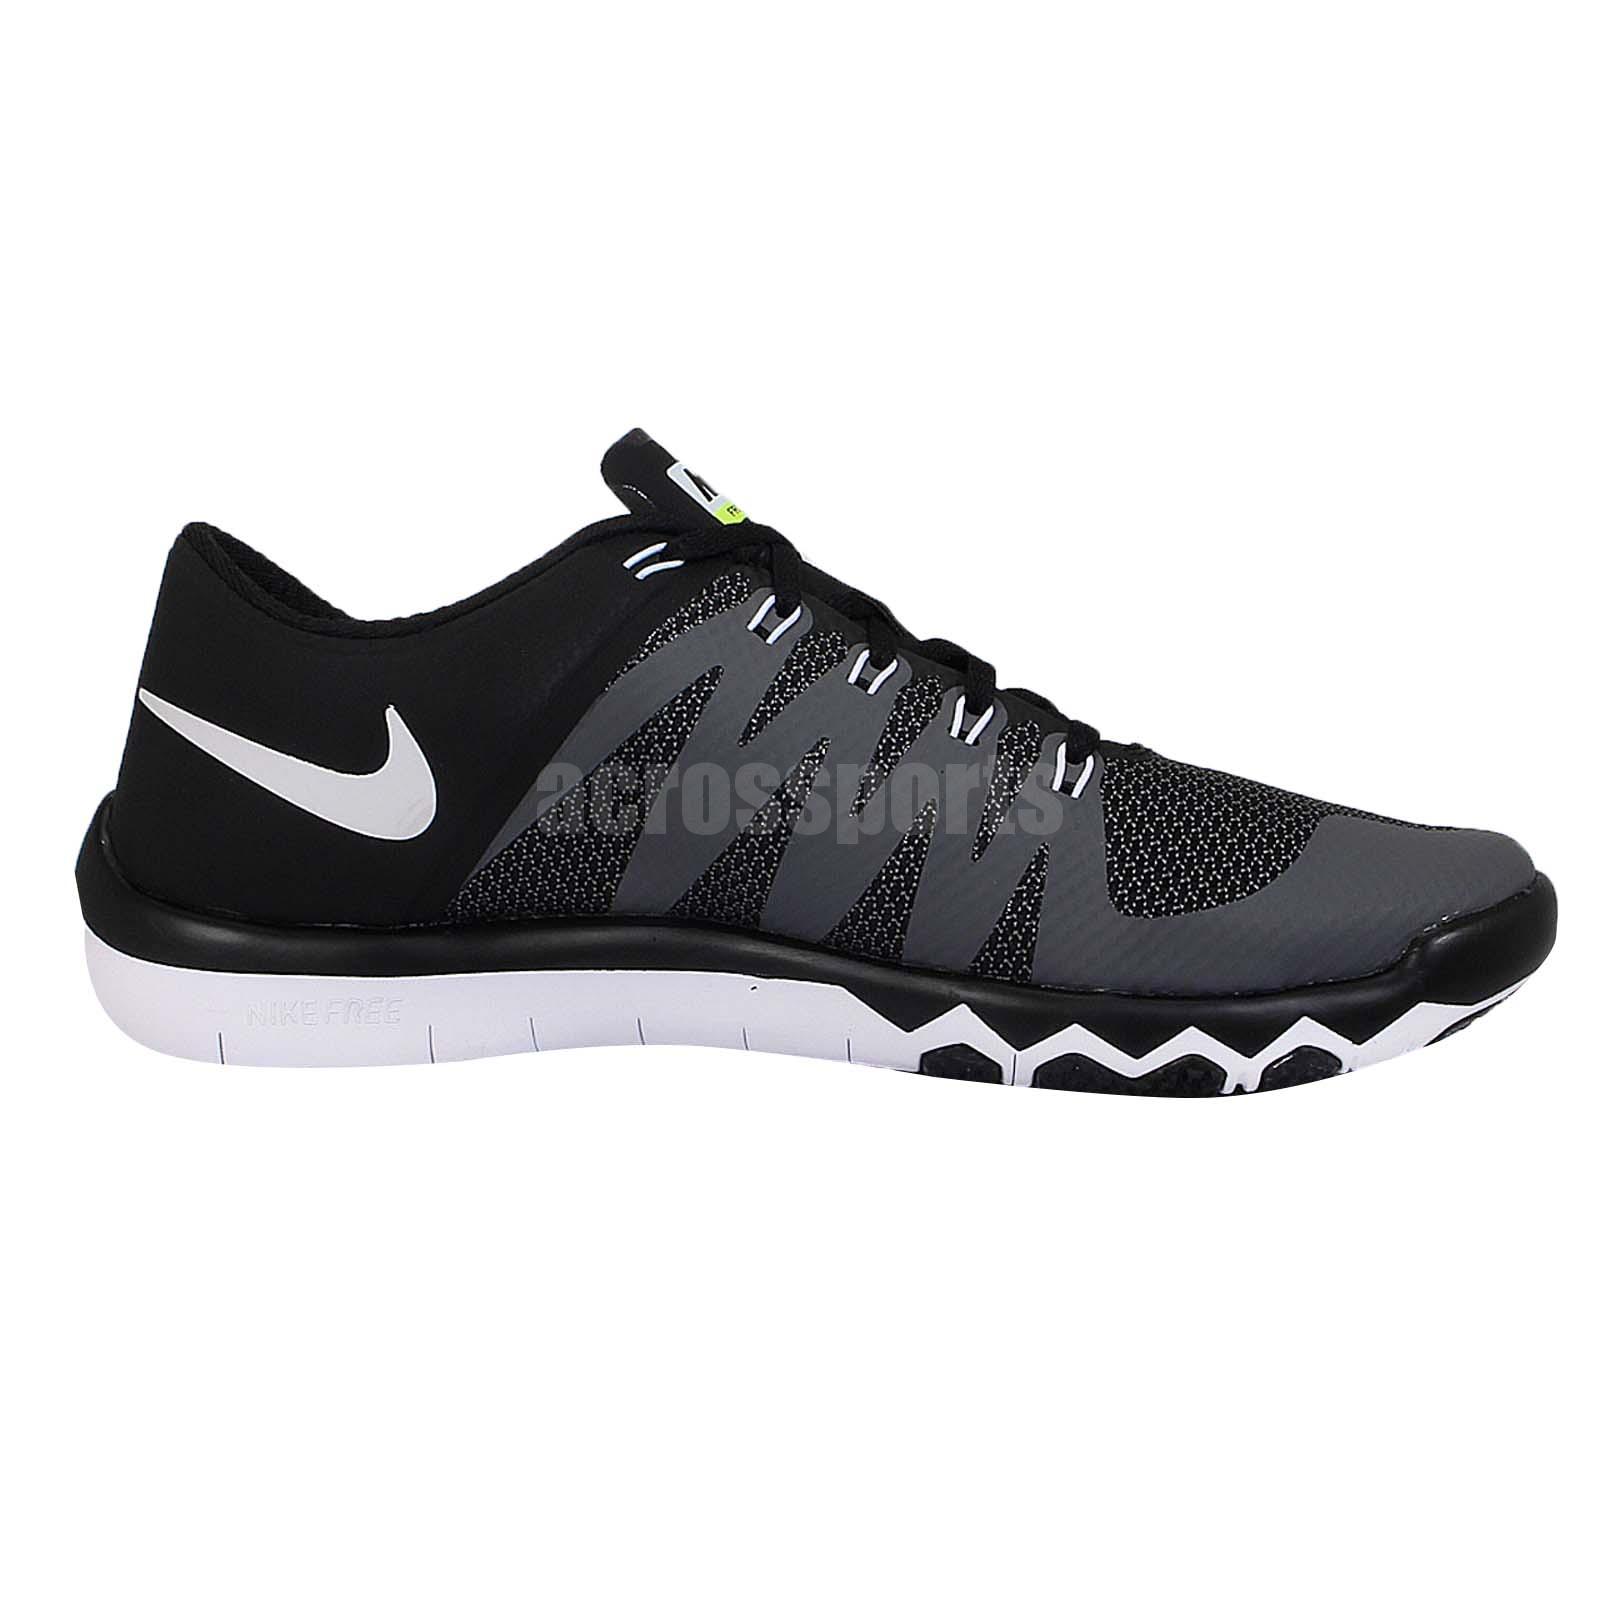 Allenatore Free 5.0 Scarpe Da Cross-training Nike Uomo Nero 14UjtADn